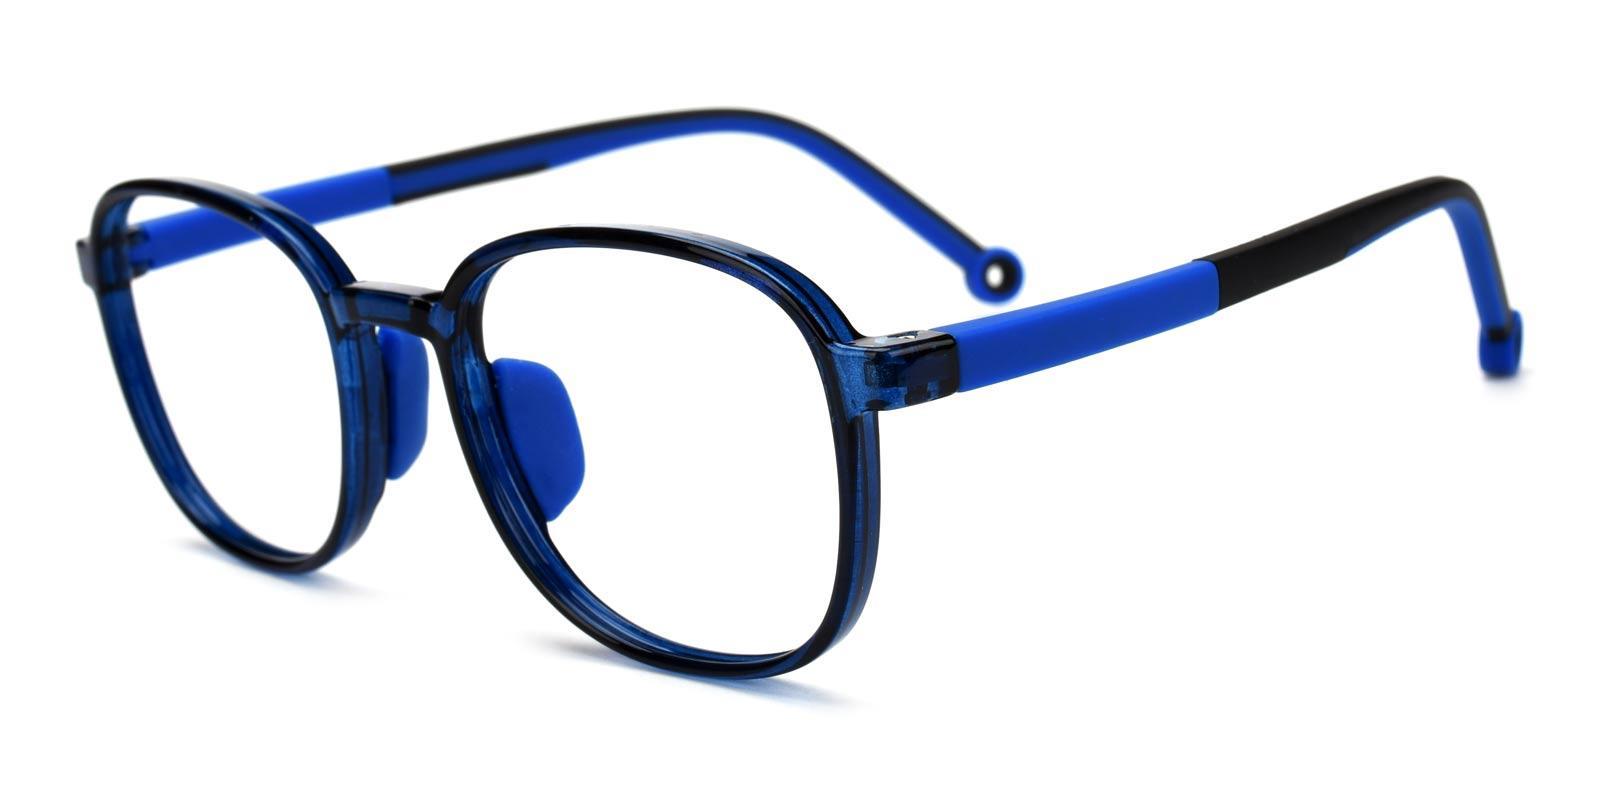 Warren-Translucent-Rectangle-Plastic-Eyeglasses-detail